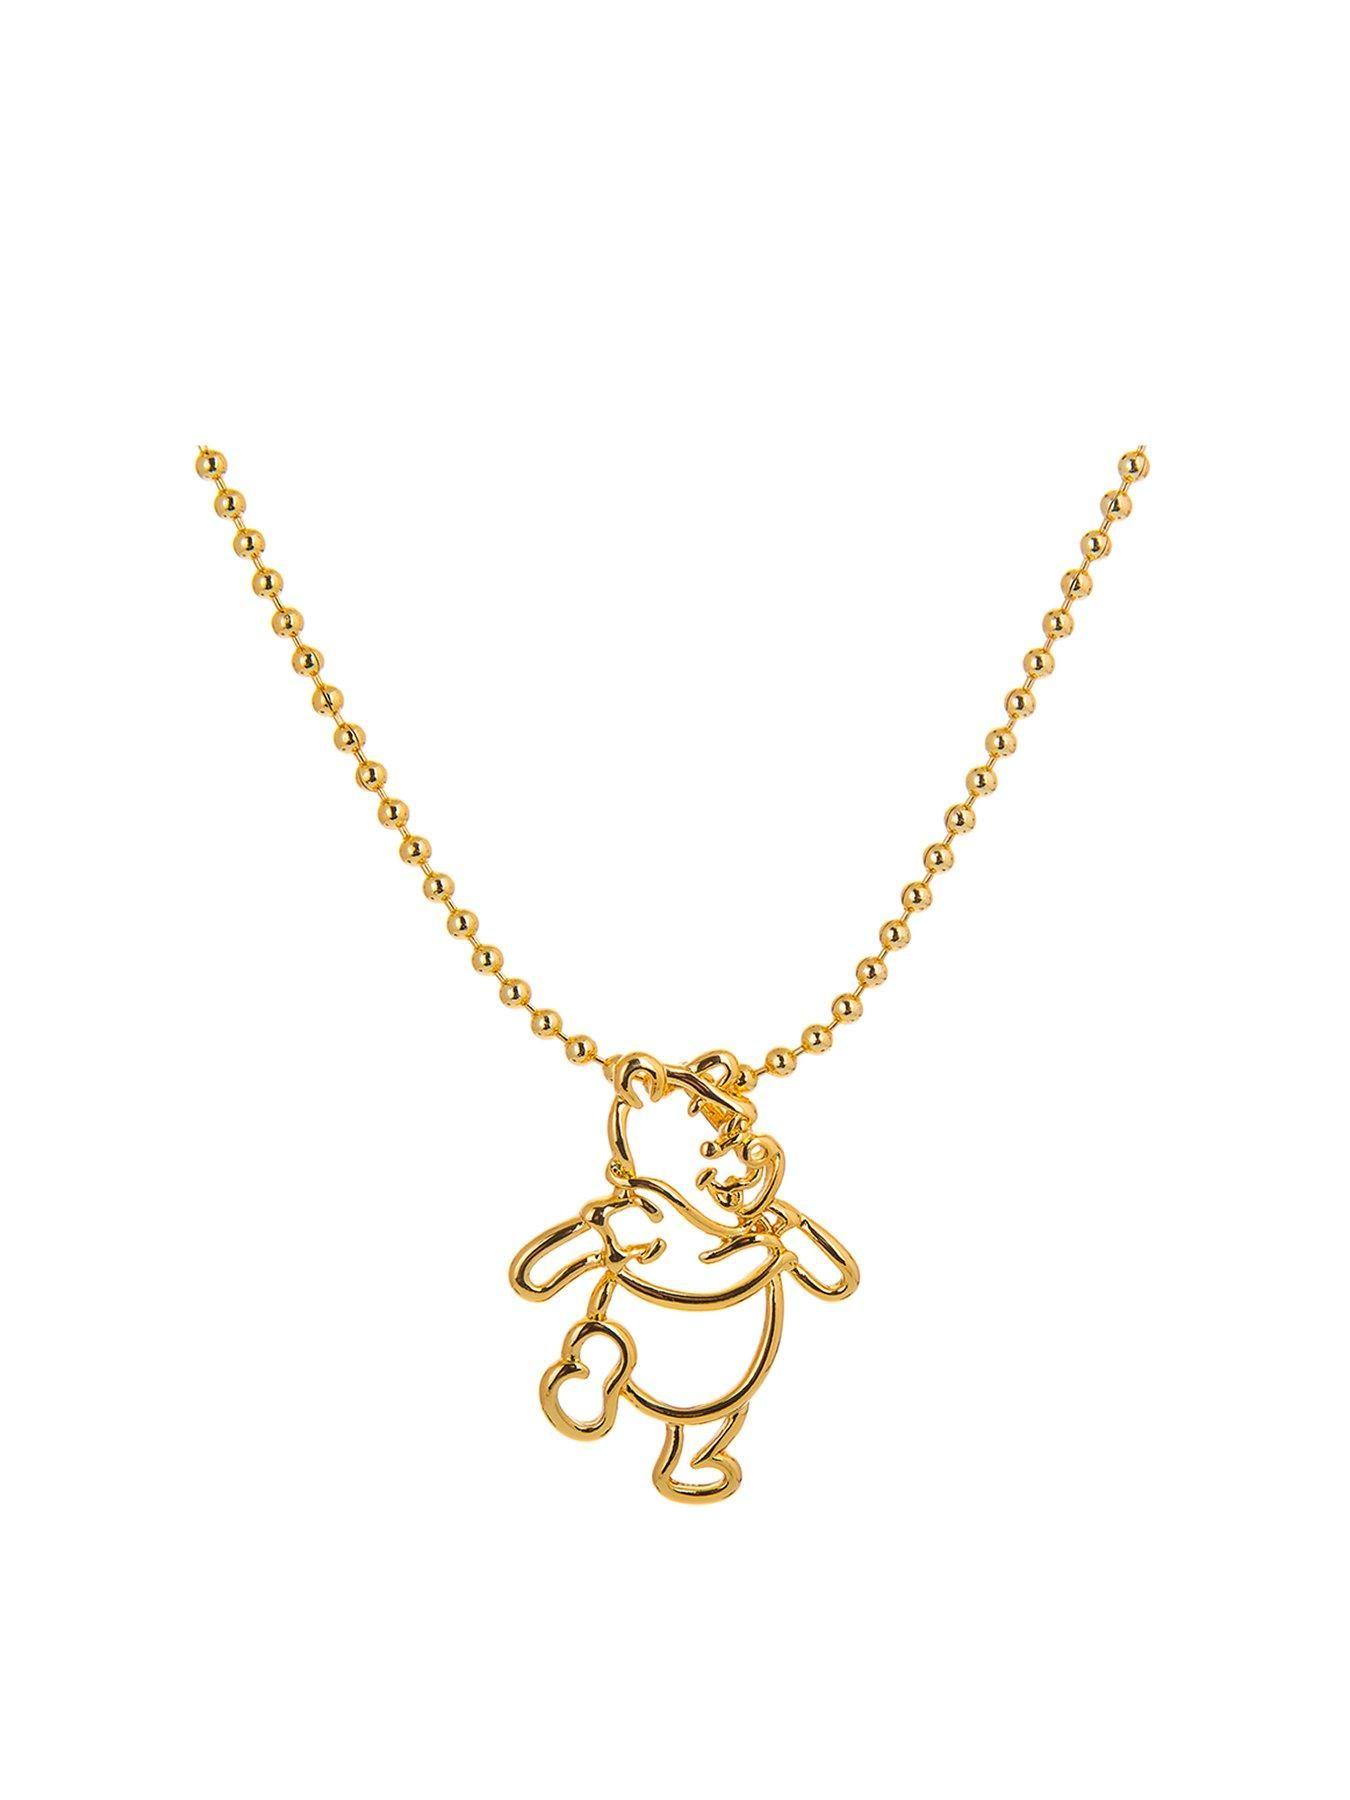 31++ Winnie the pooh gold jewelry ideas